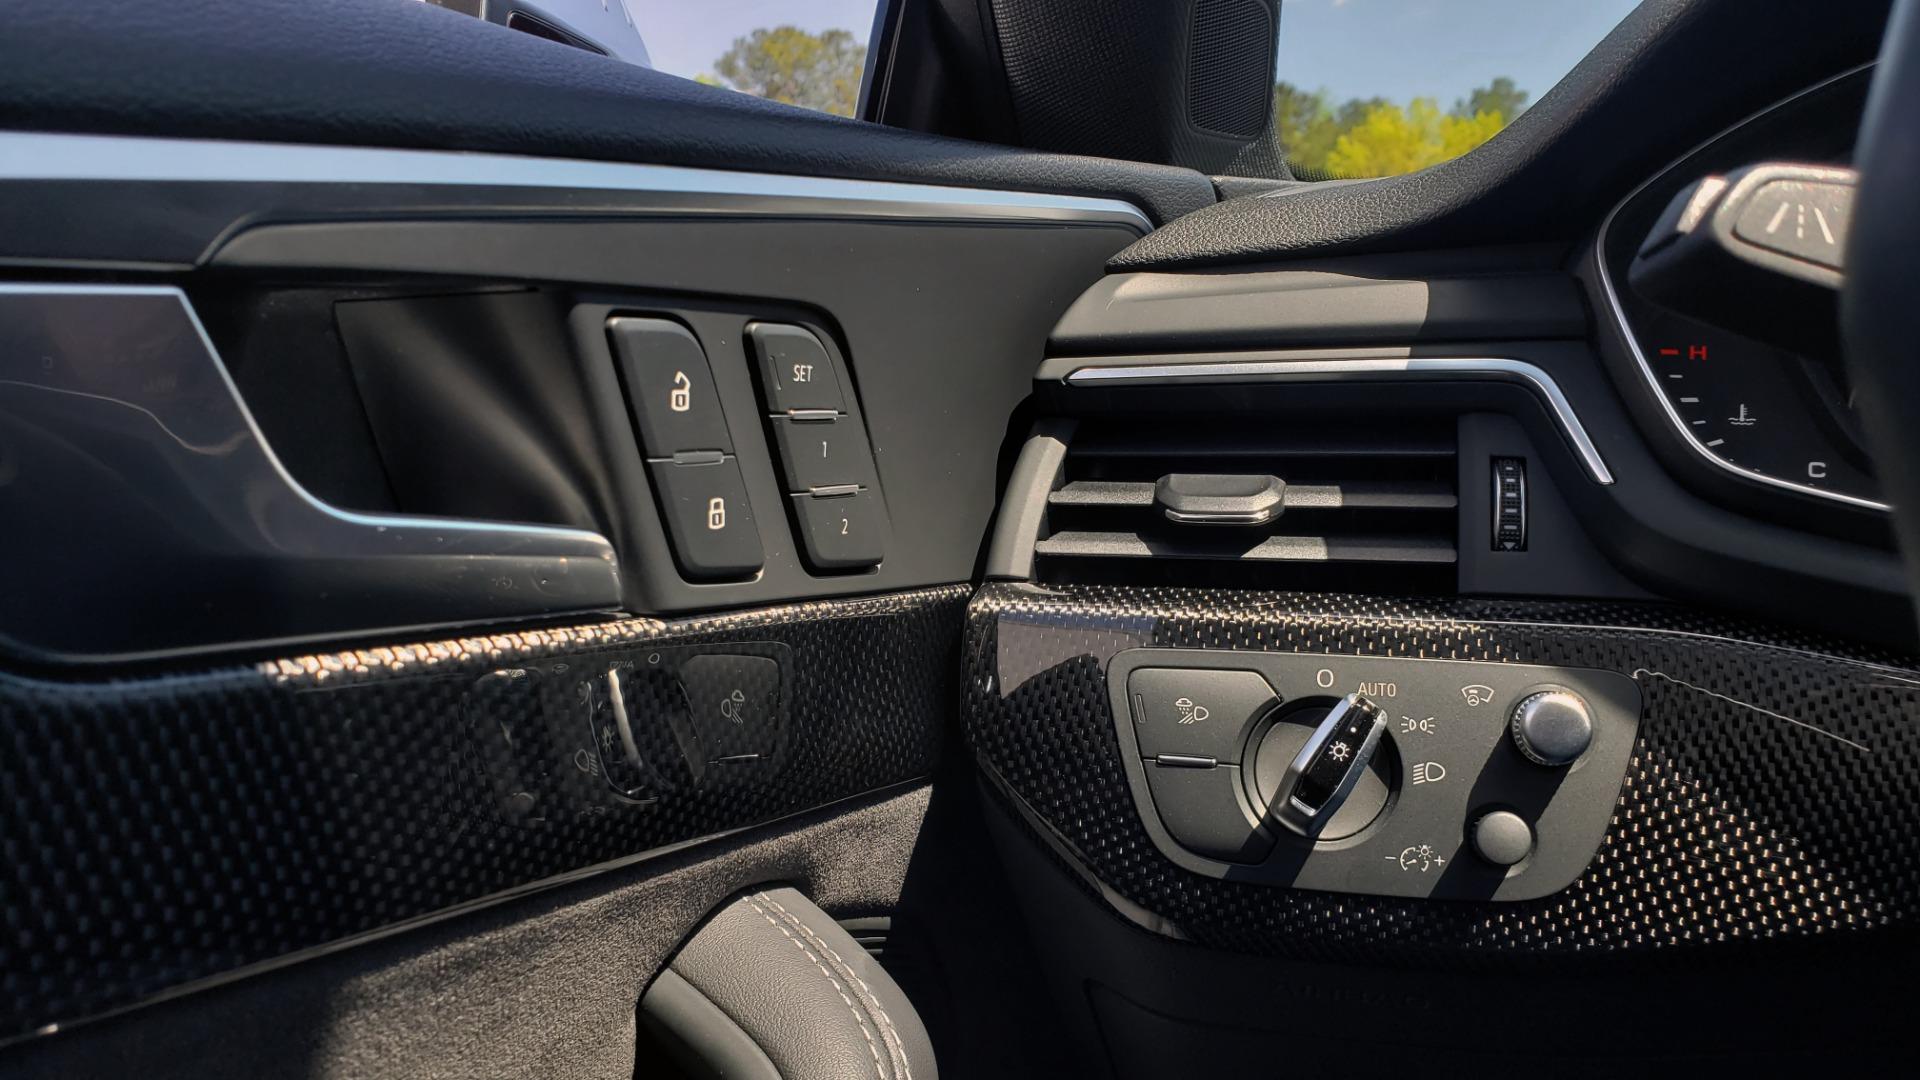 Used 2018 Audi S5 SPORTBACK PRESTIGE S-SPORT / NAV / SUNROOF / HUD / B&O SND / REARVIEW for sale $48,995 at Formula Imports in Charlotte NC 28227 38